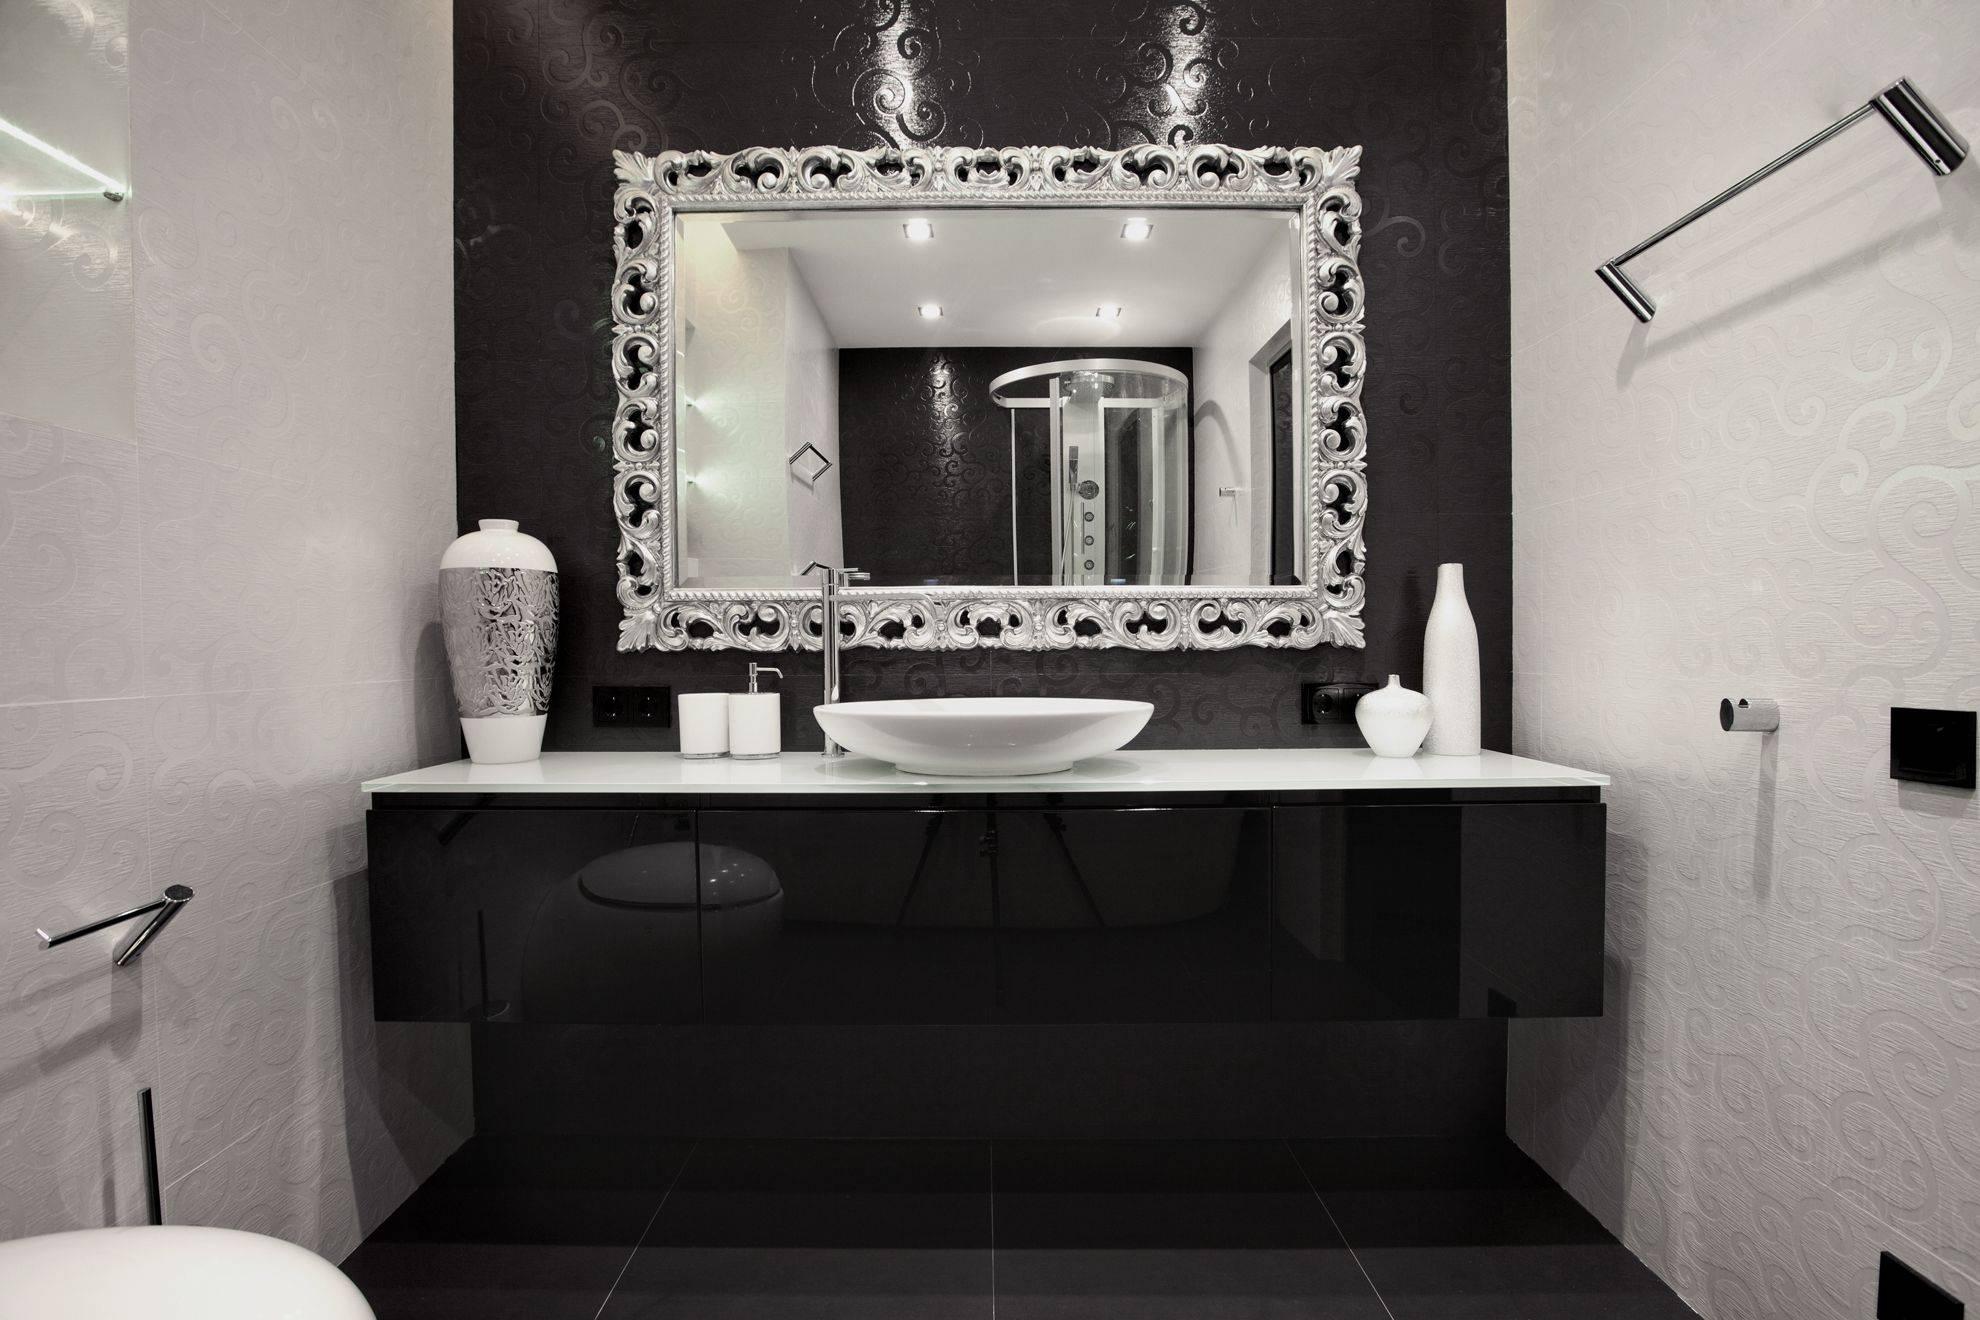 Silver Bathroom Mirror Rectangular – Harpsounds.co throughout Silver Rectangular Bathroom Mirrors (Image 22 of 25)